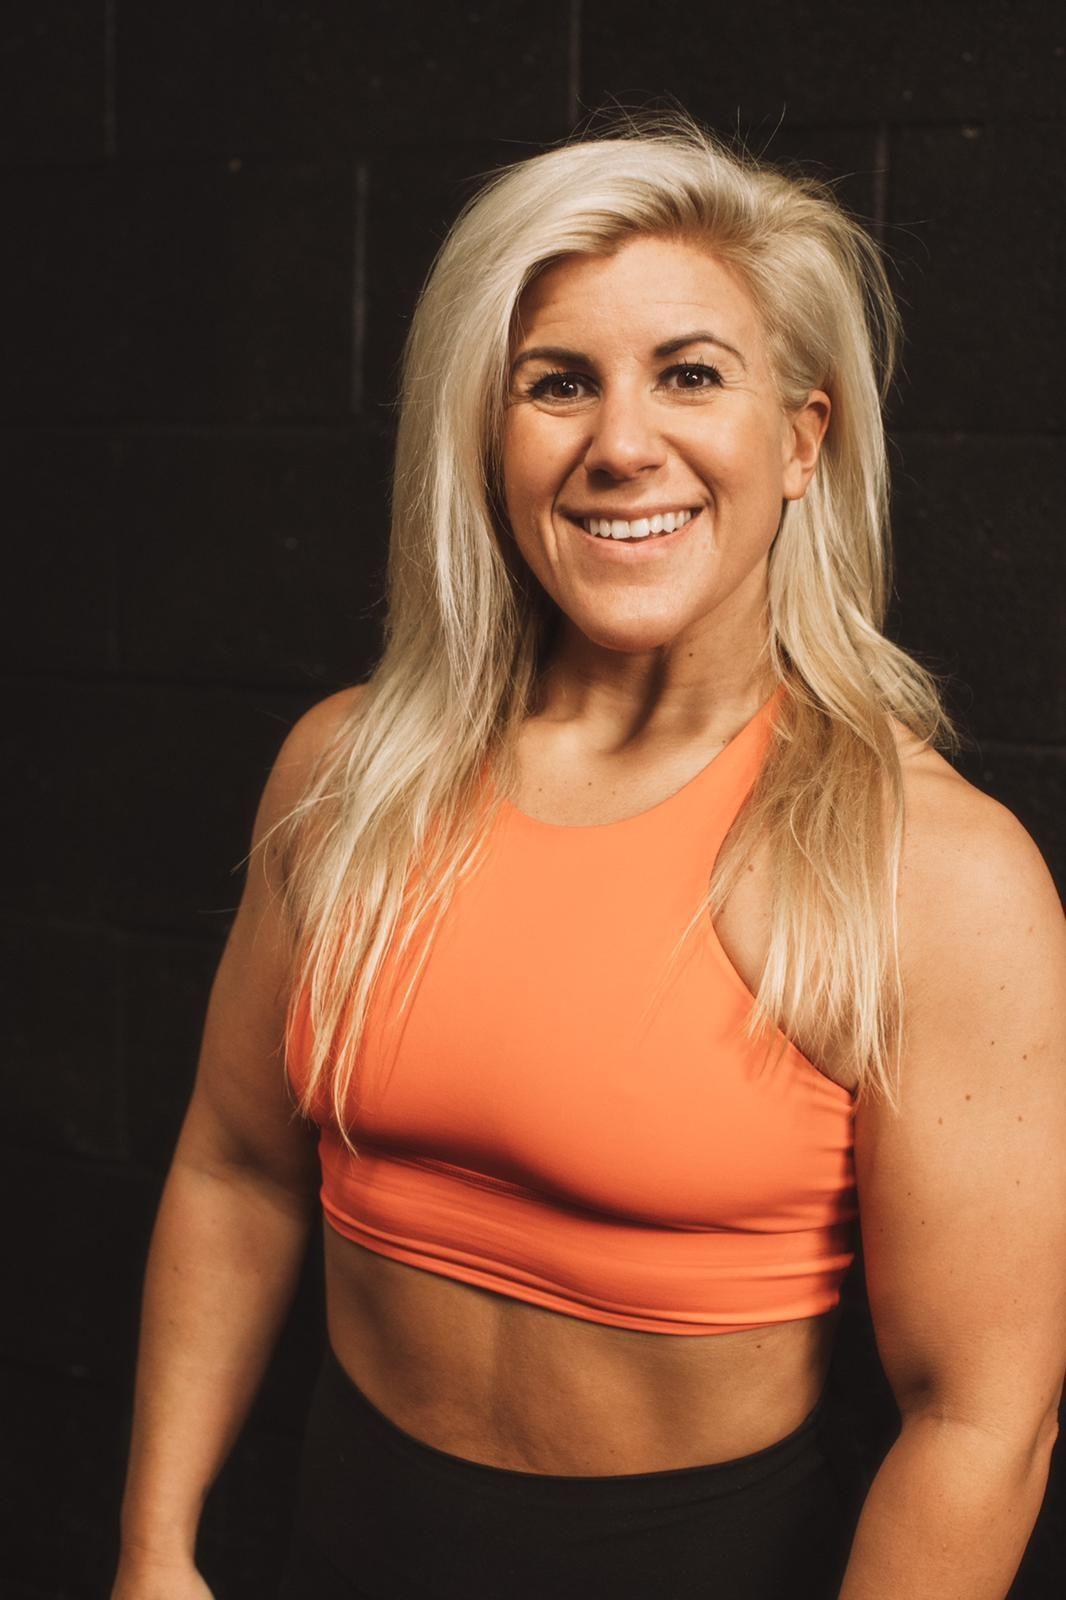 Laura 'Biceps' Hoggins